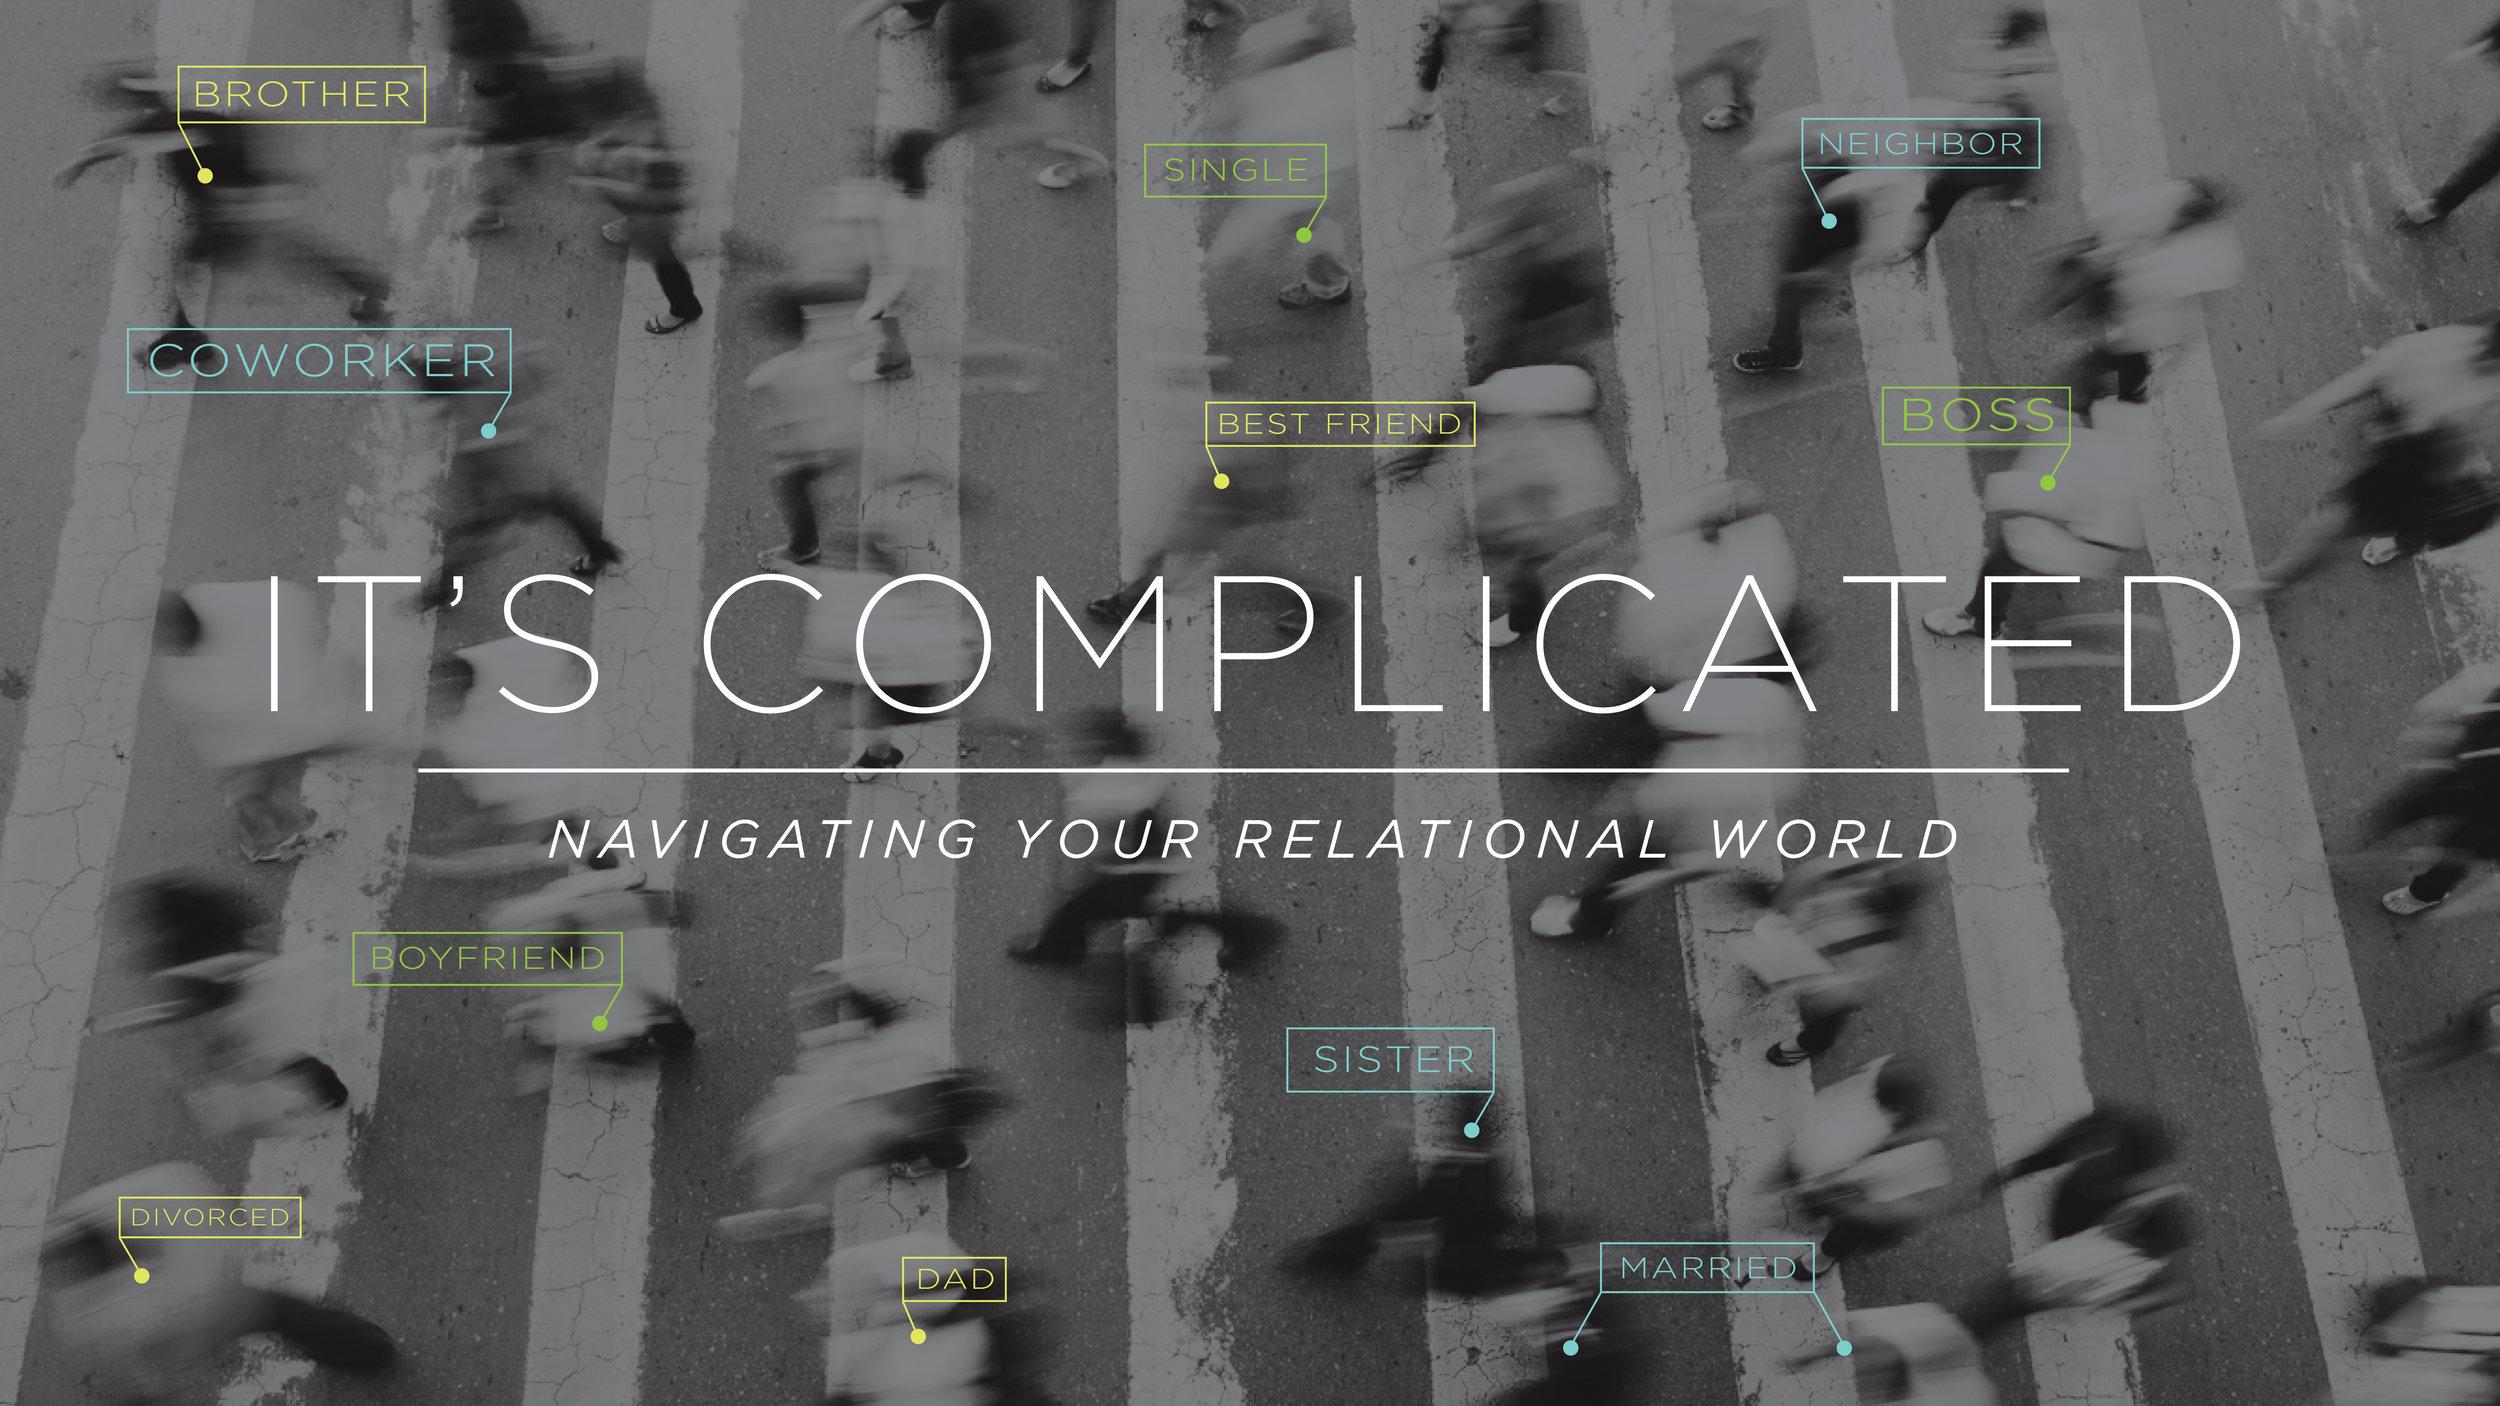 itscomplicatedgraphic